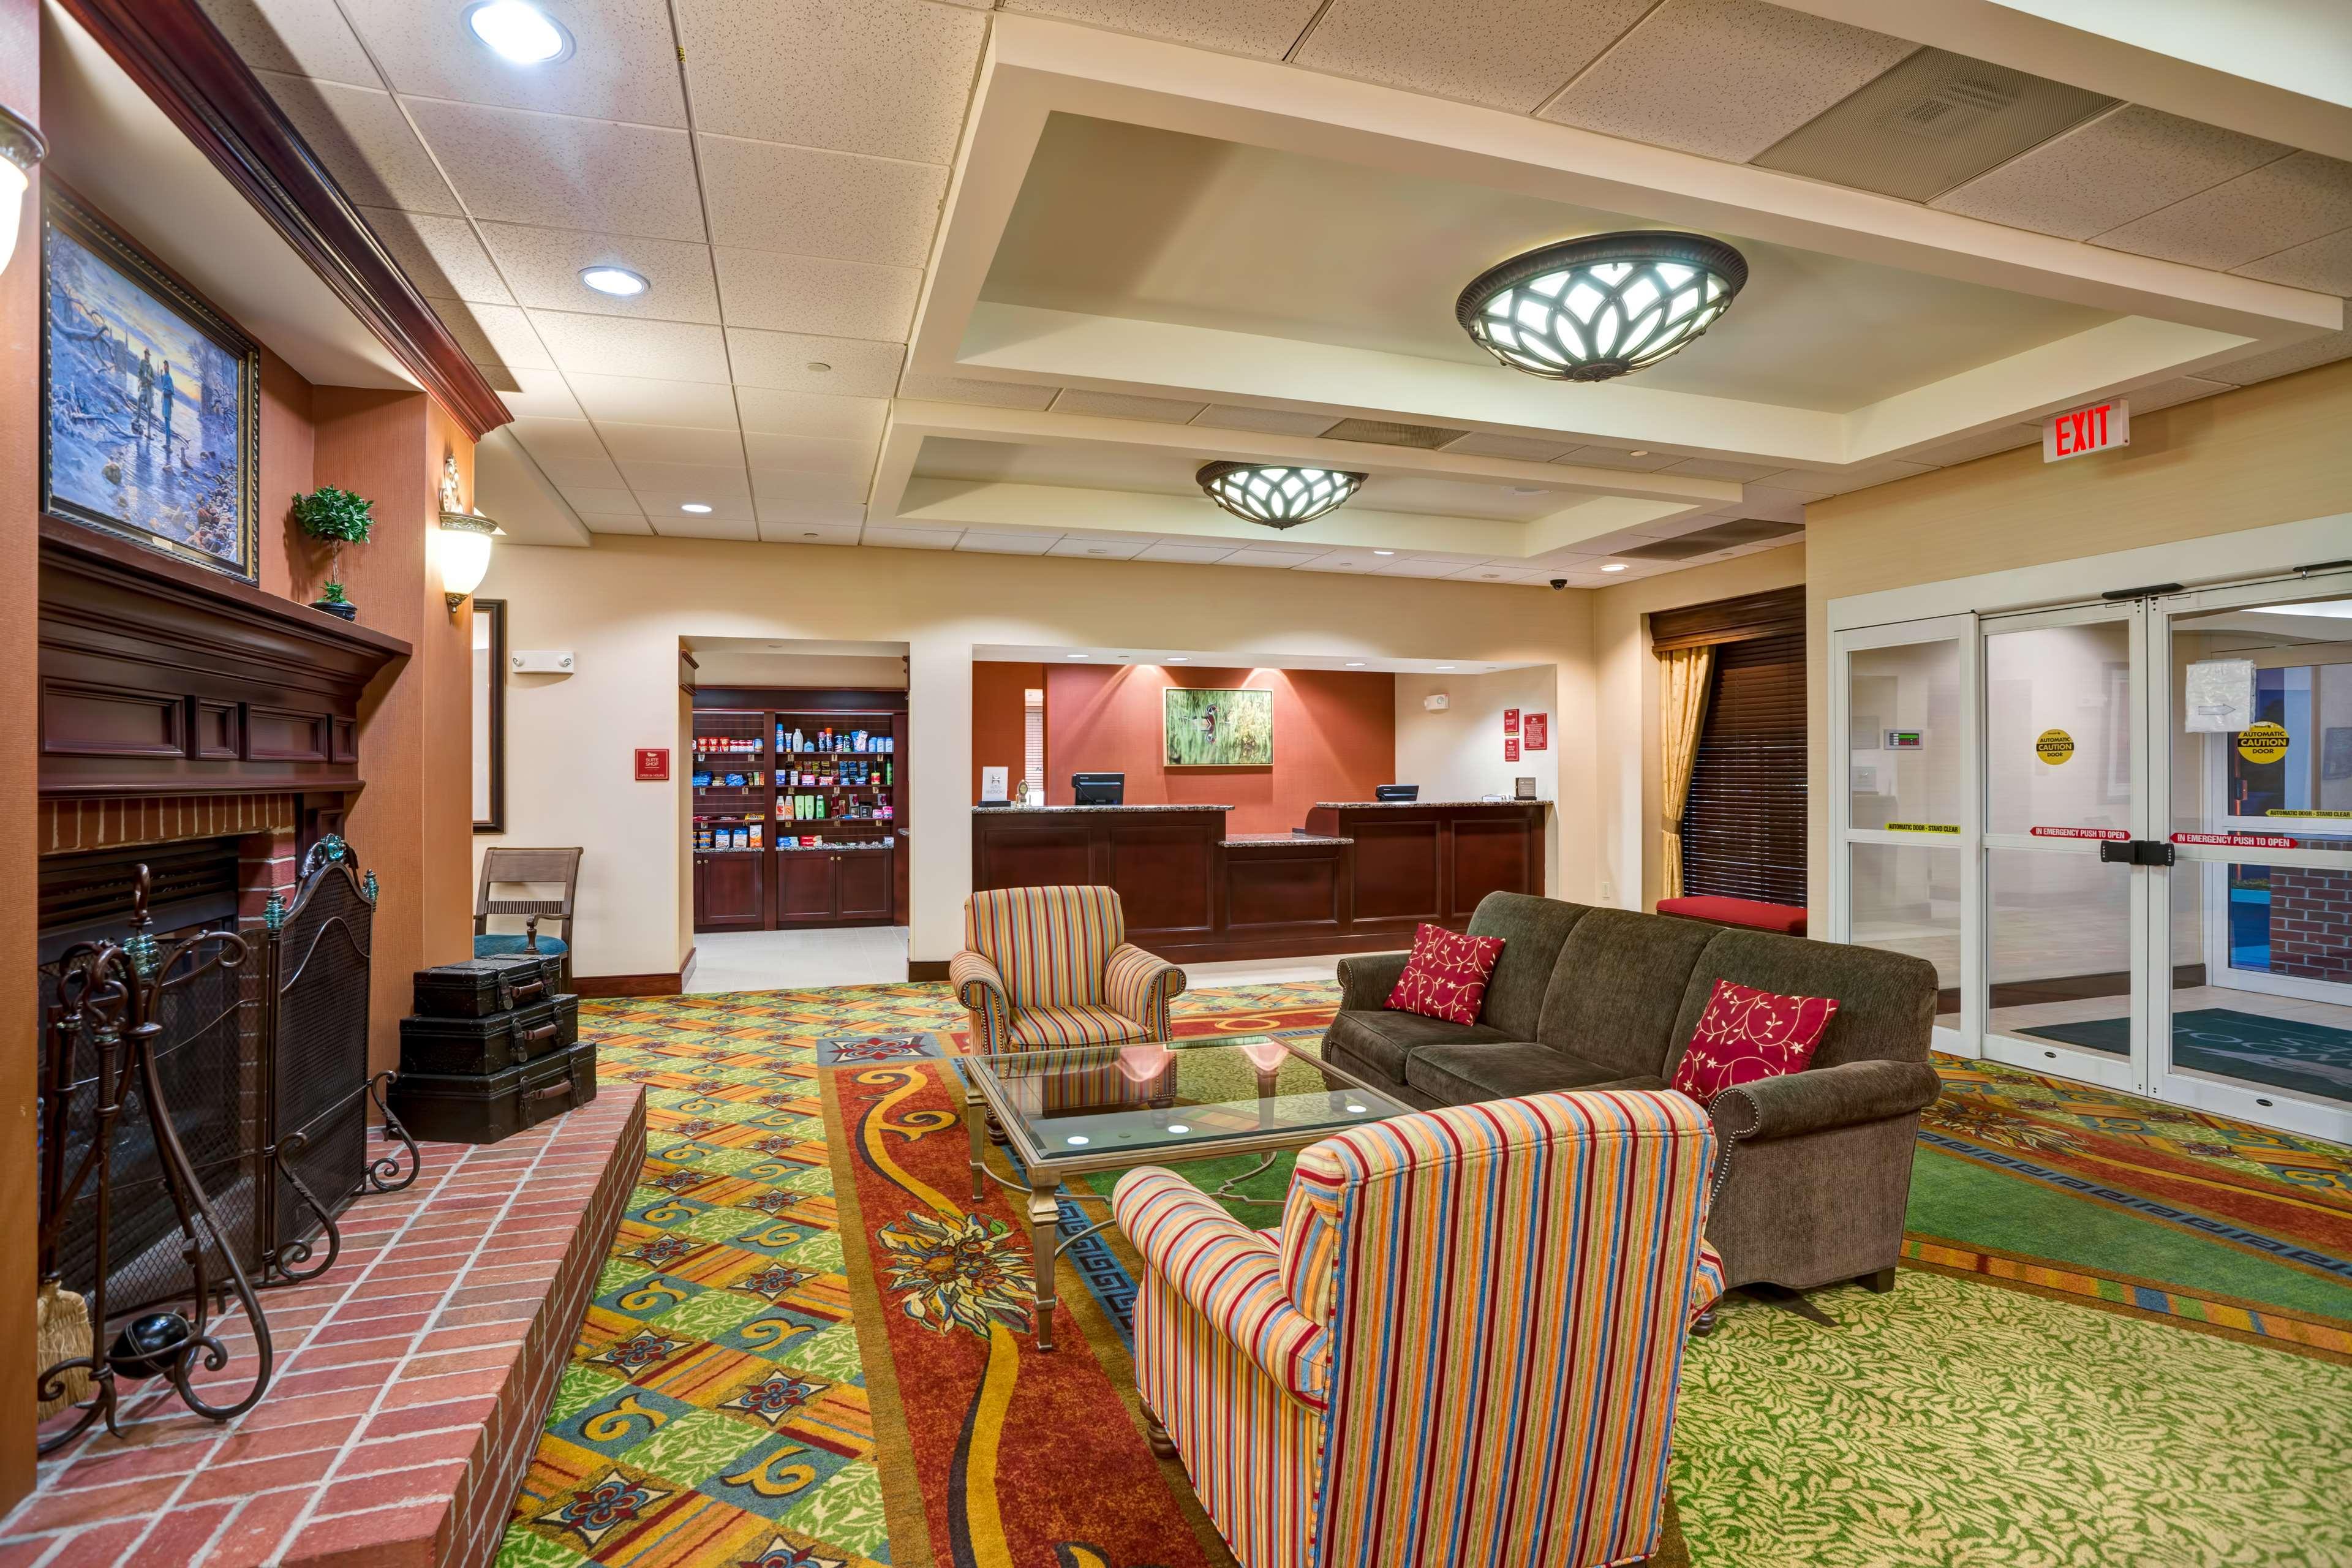 Homewood Suites by Hilton Fredericksburg image 4